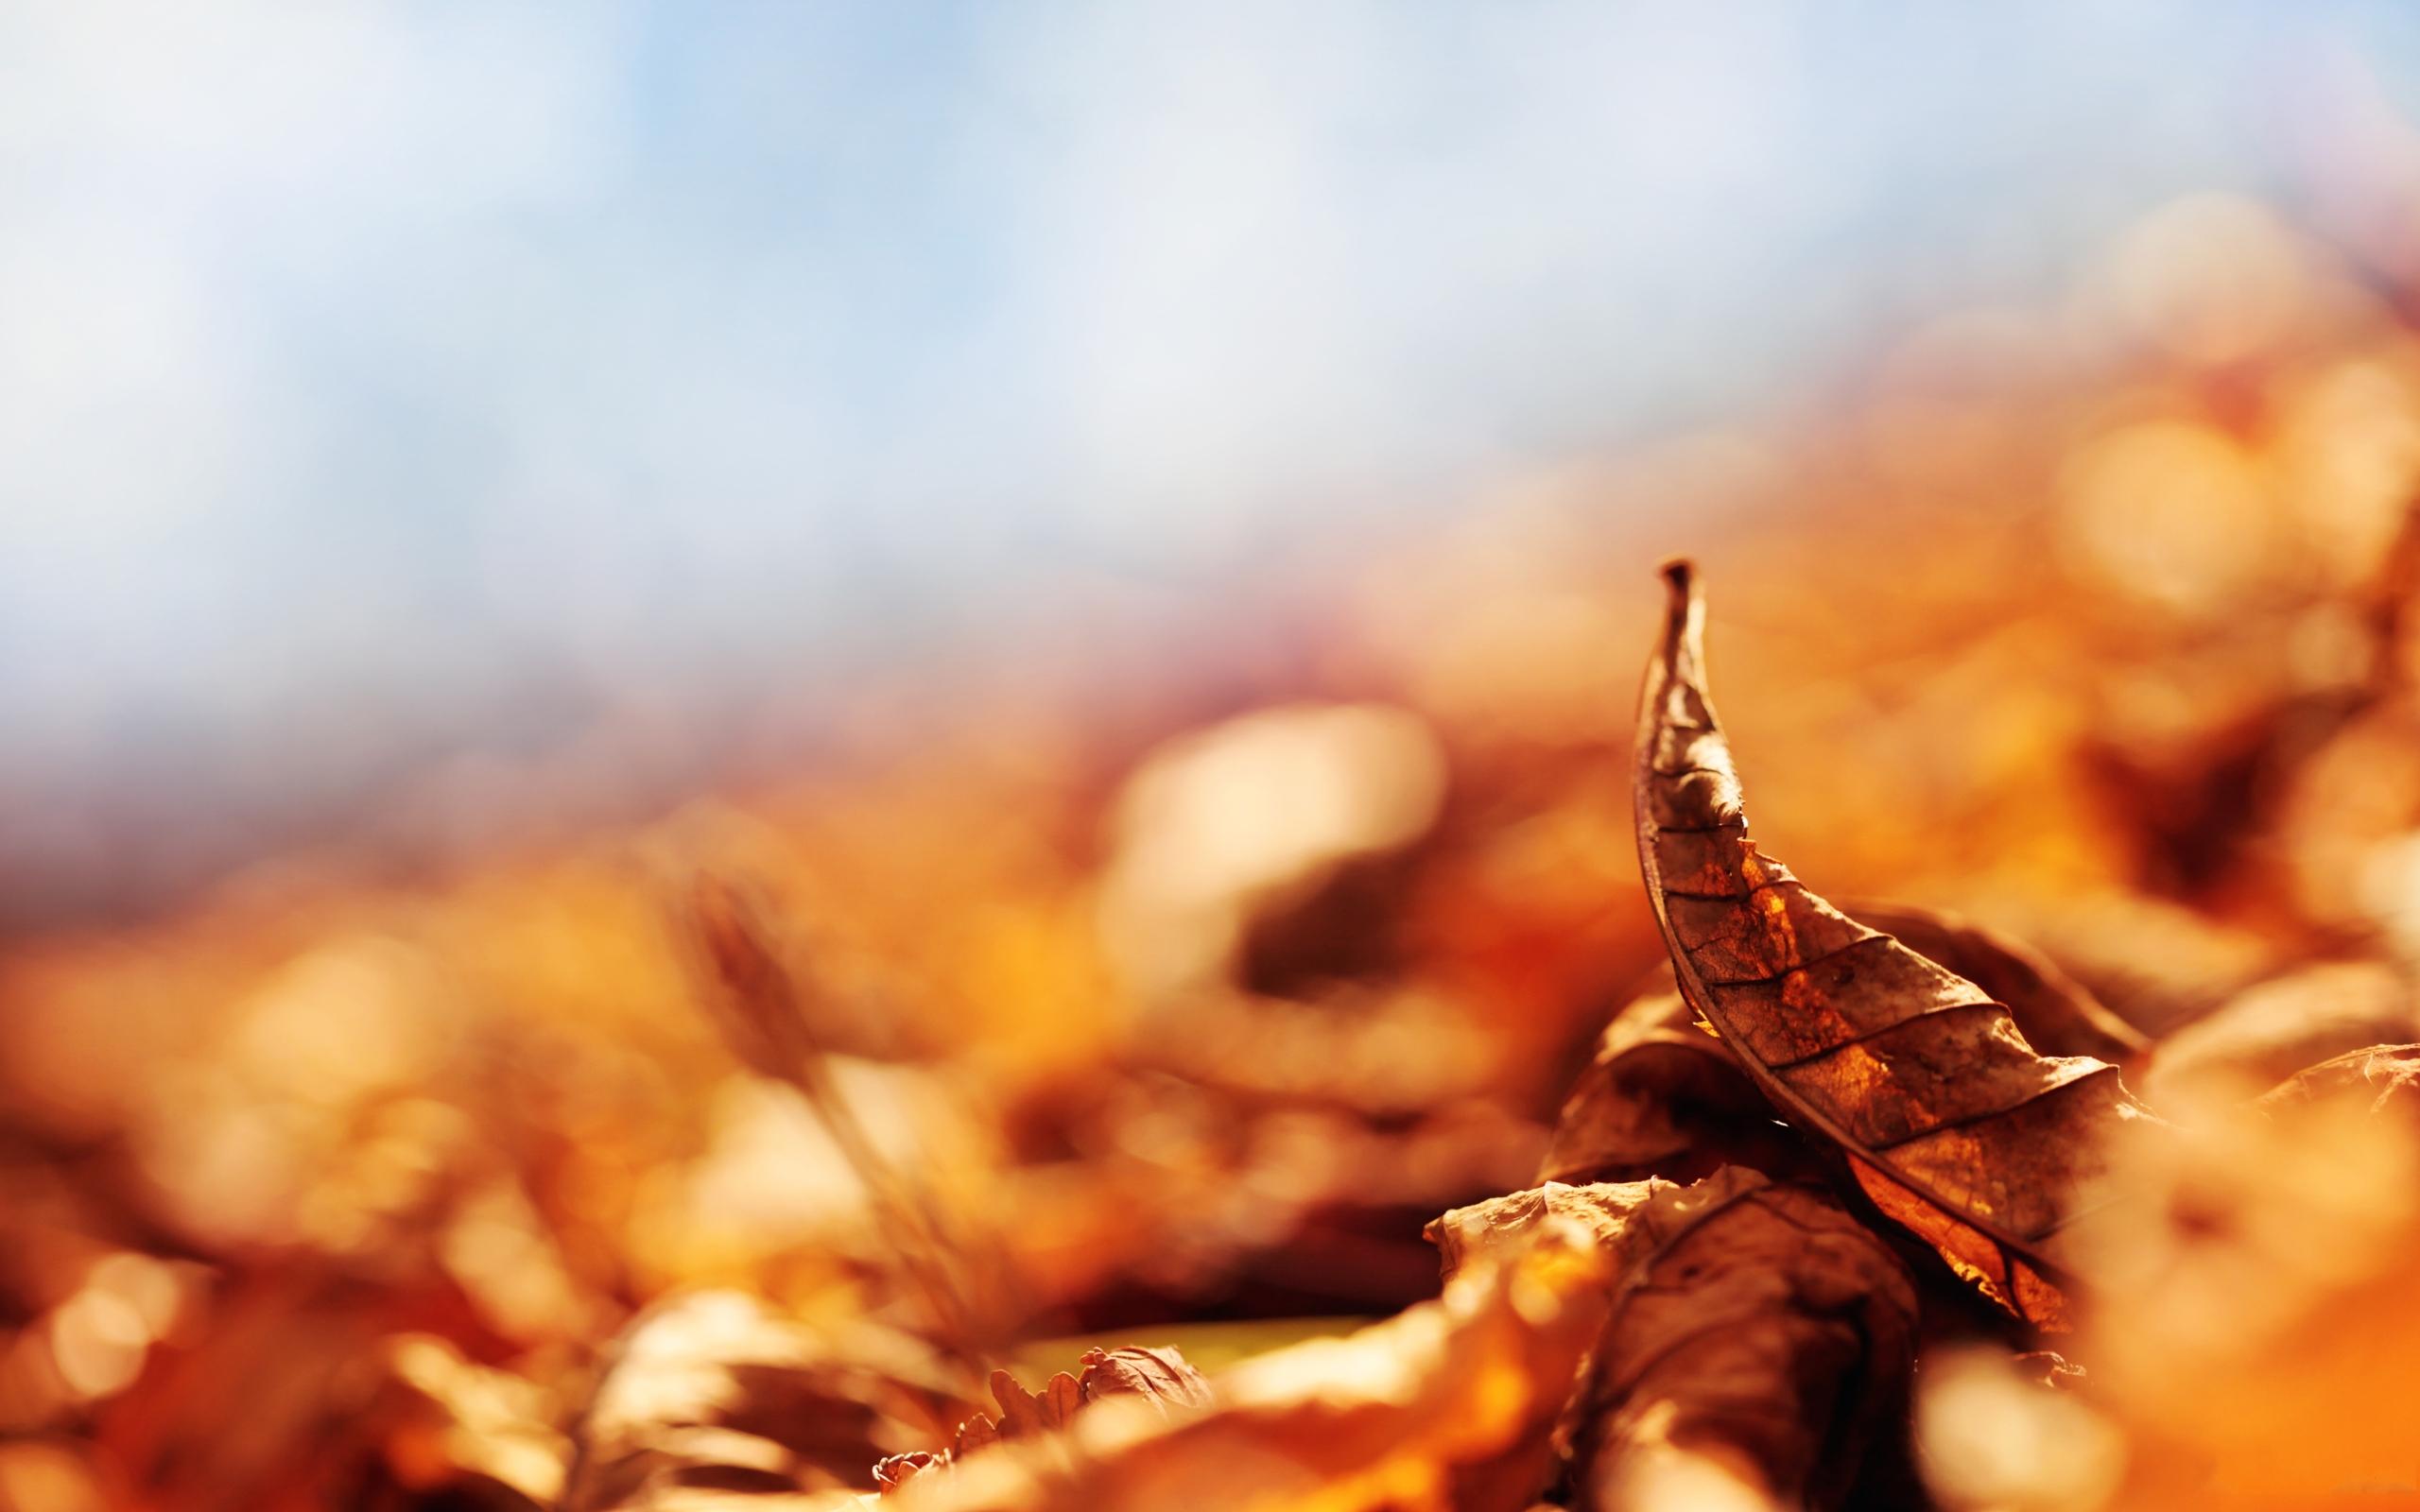 Fall Leaves Desktop Wallpaper Backgrounds Autumn Leaf Brown Hd Desktop Wallpapers 4k Hd